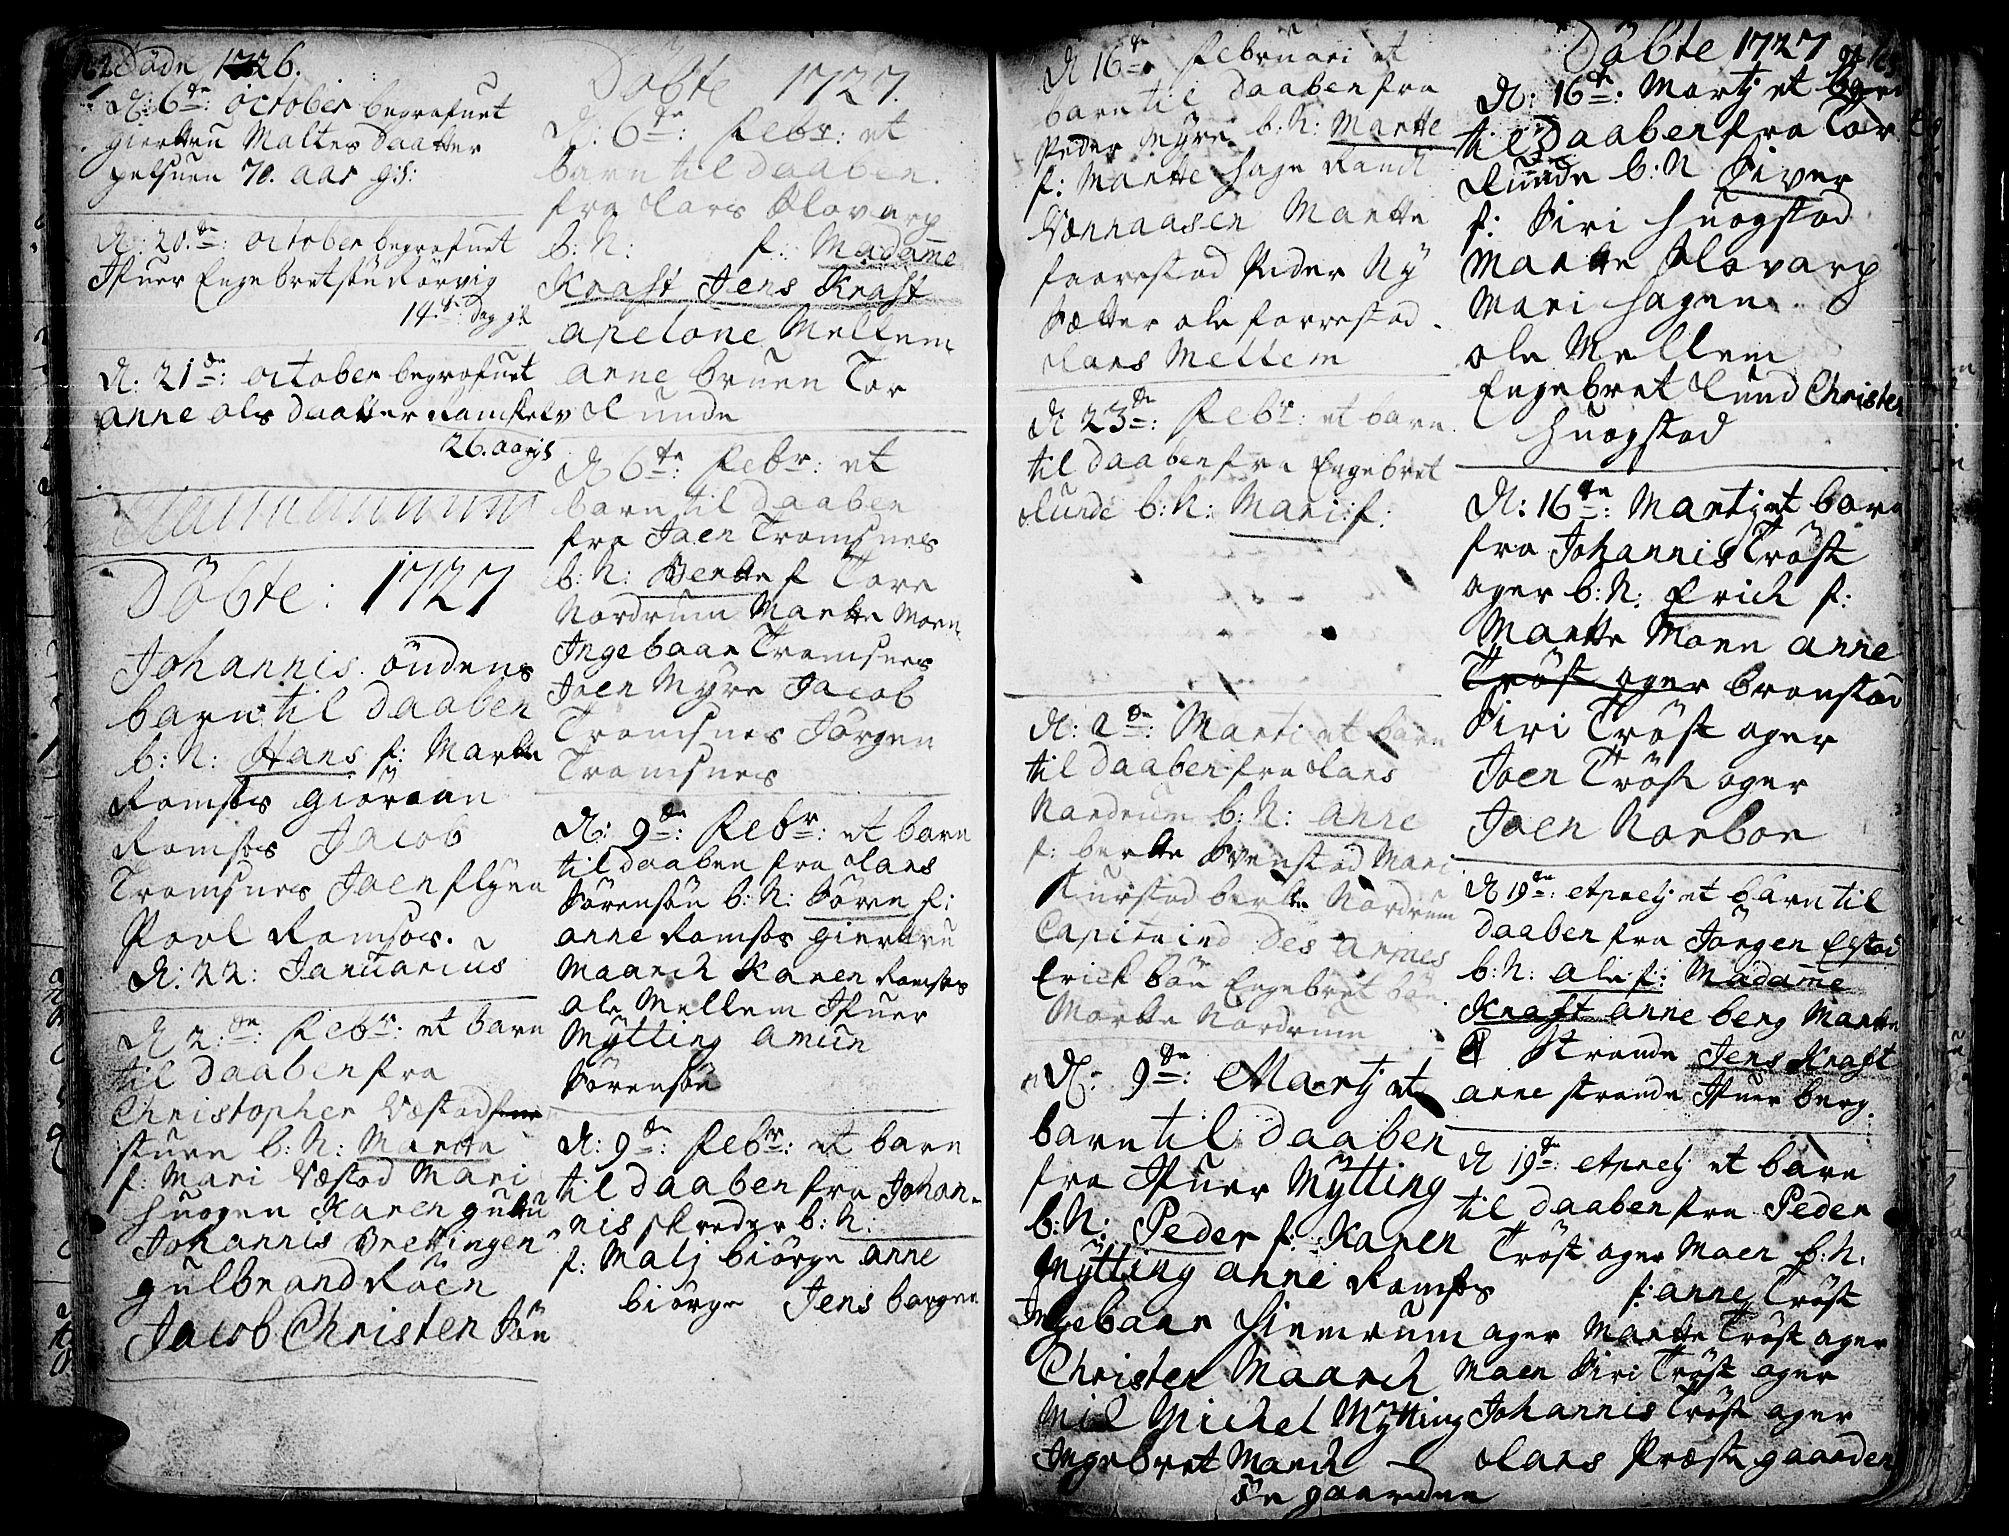 SAH, Ringebu prestekontor, Ministerialbok nr. 1, 1696-1733, s. 162-163